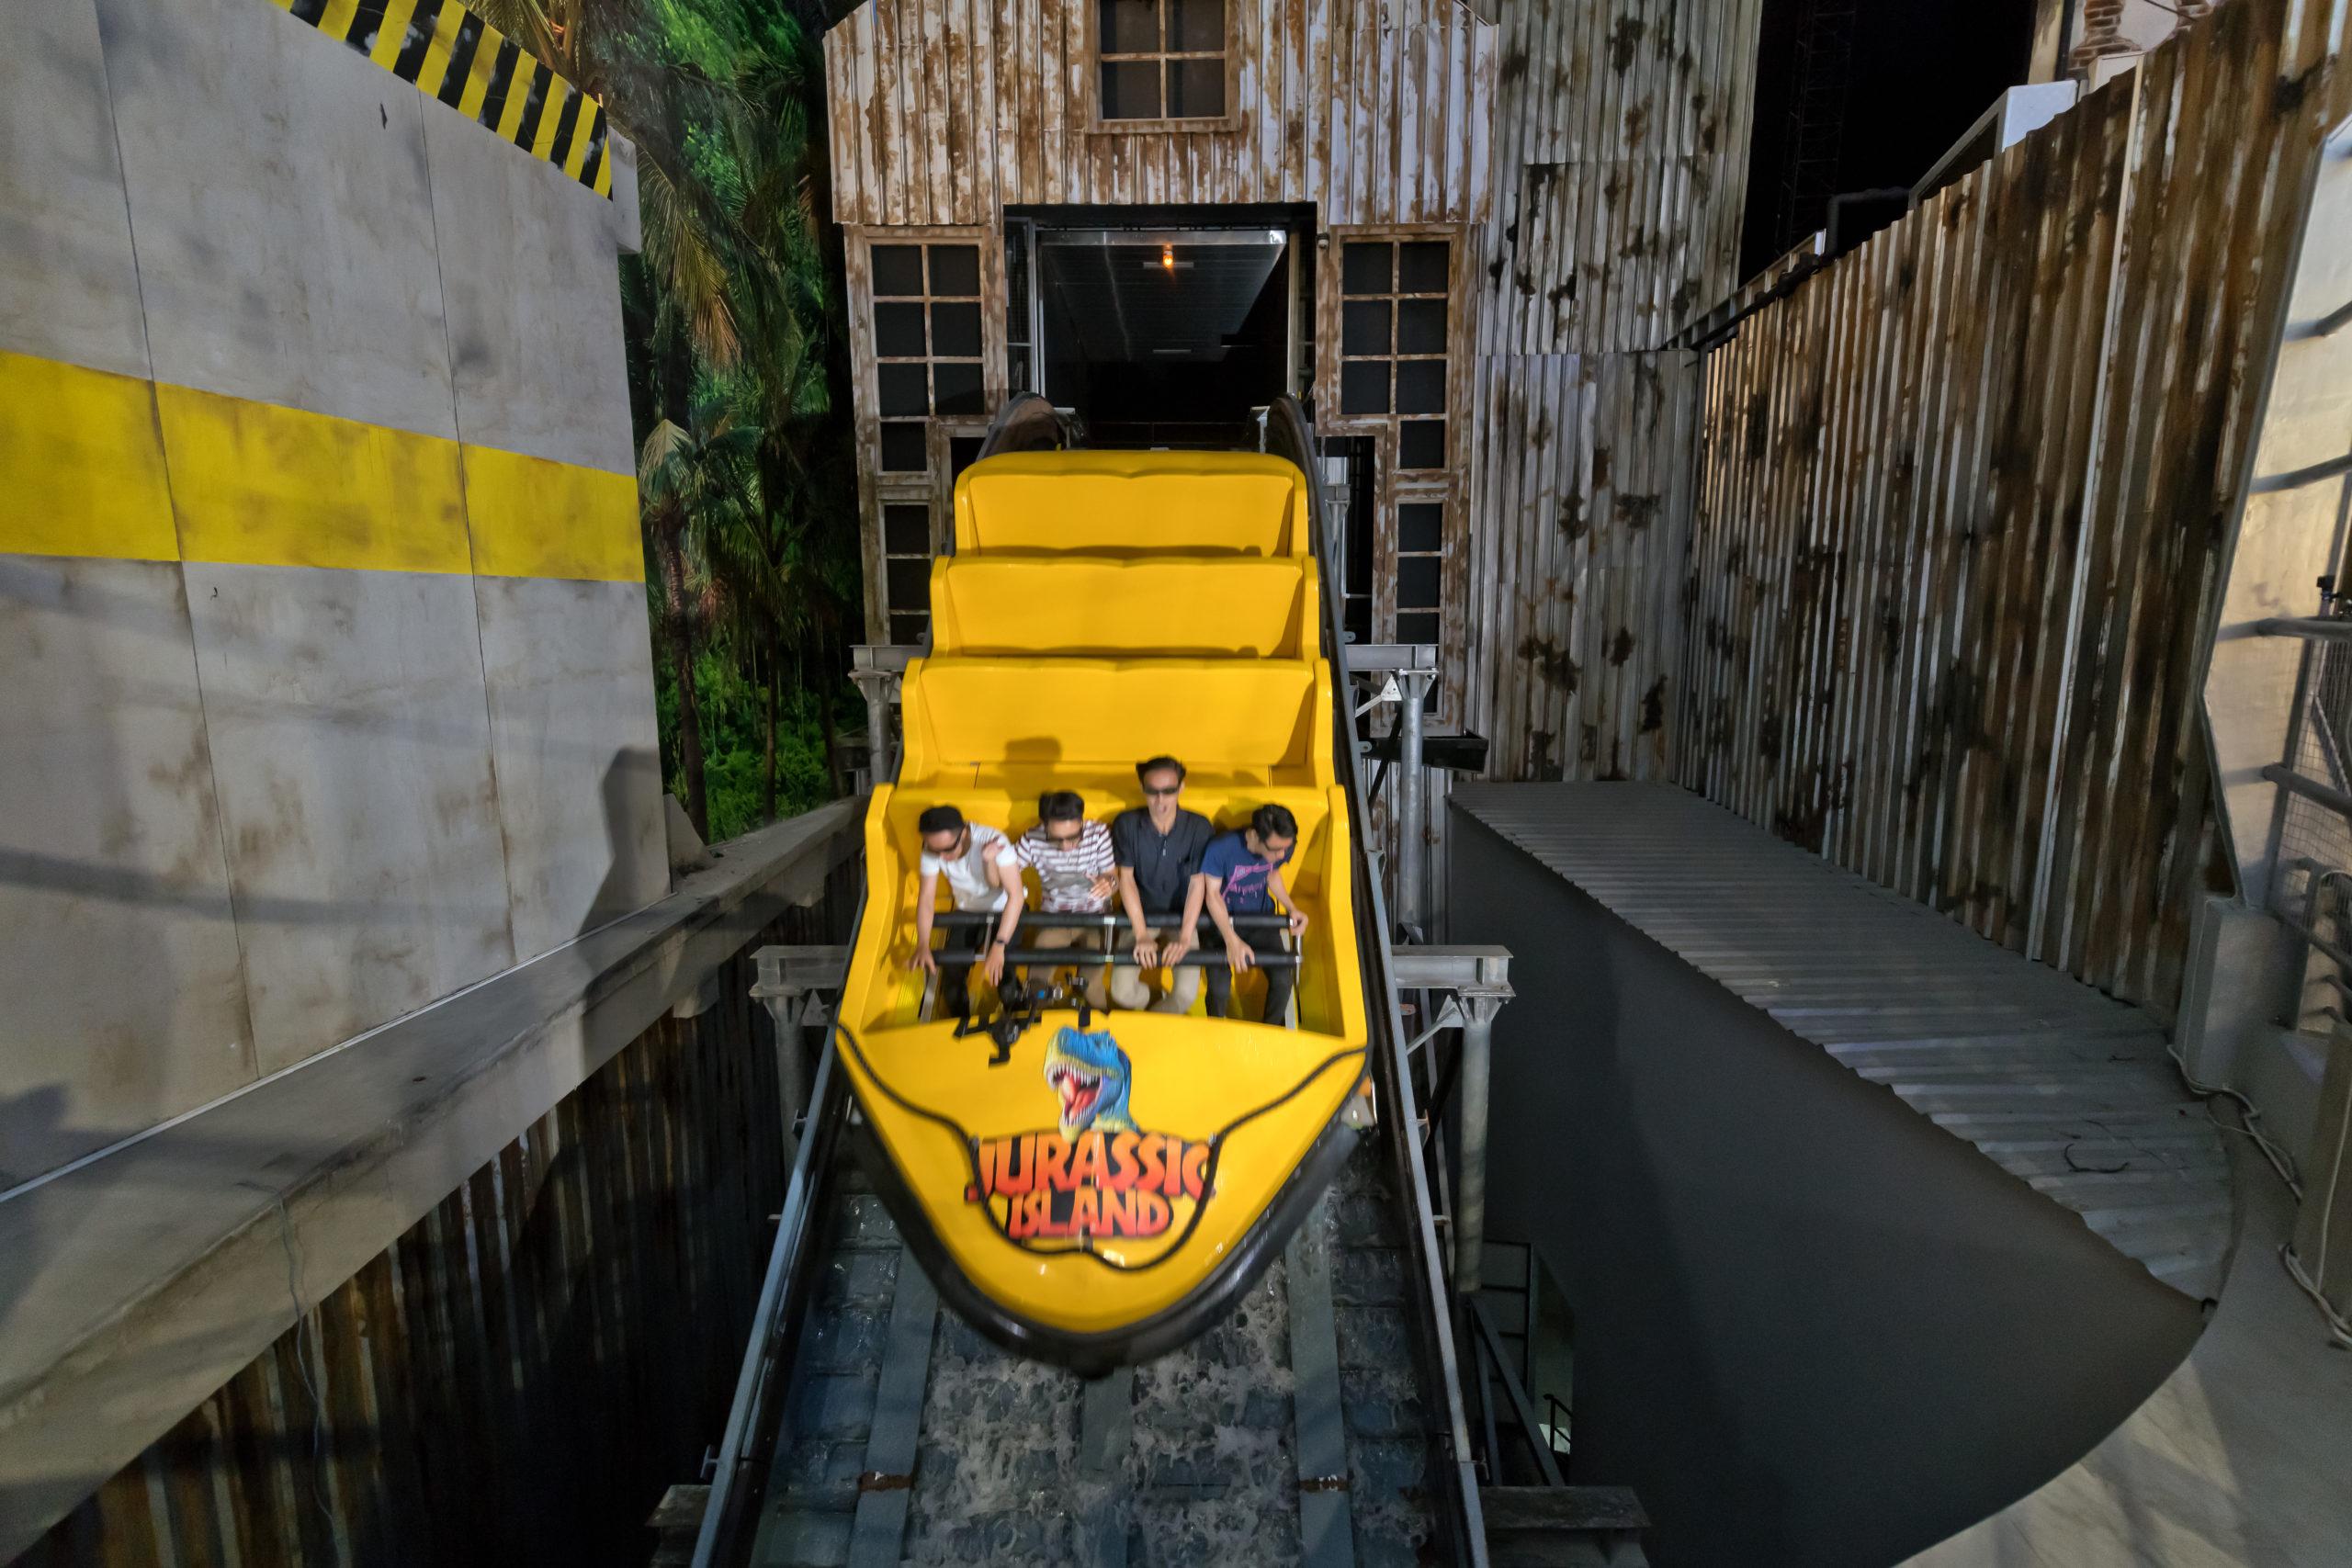 Interlink New Ride : Immersive Superflume Jurassic Island at Trans Studio Cibubur Final Plunge